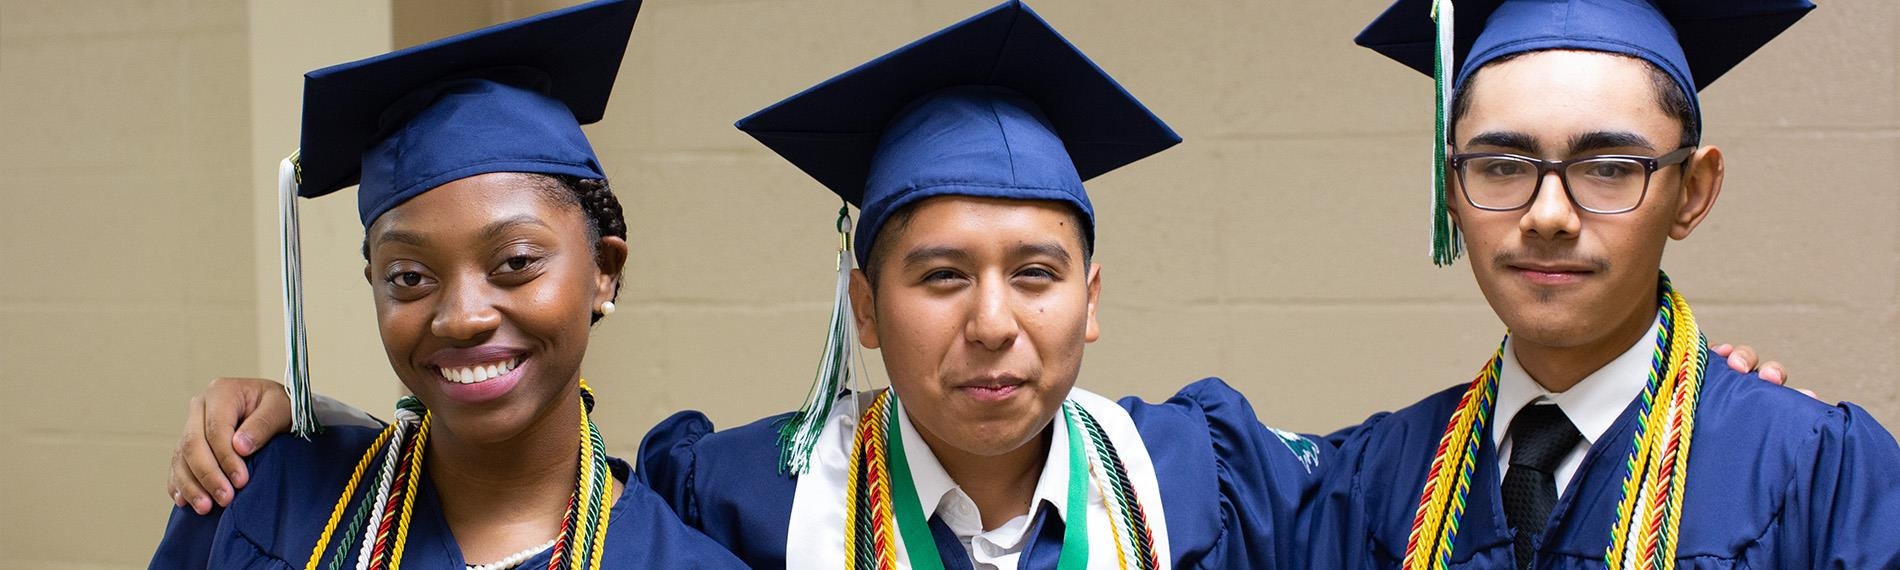 Graduation Class of 21